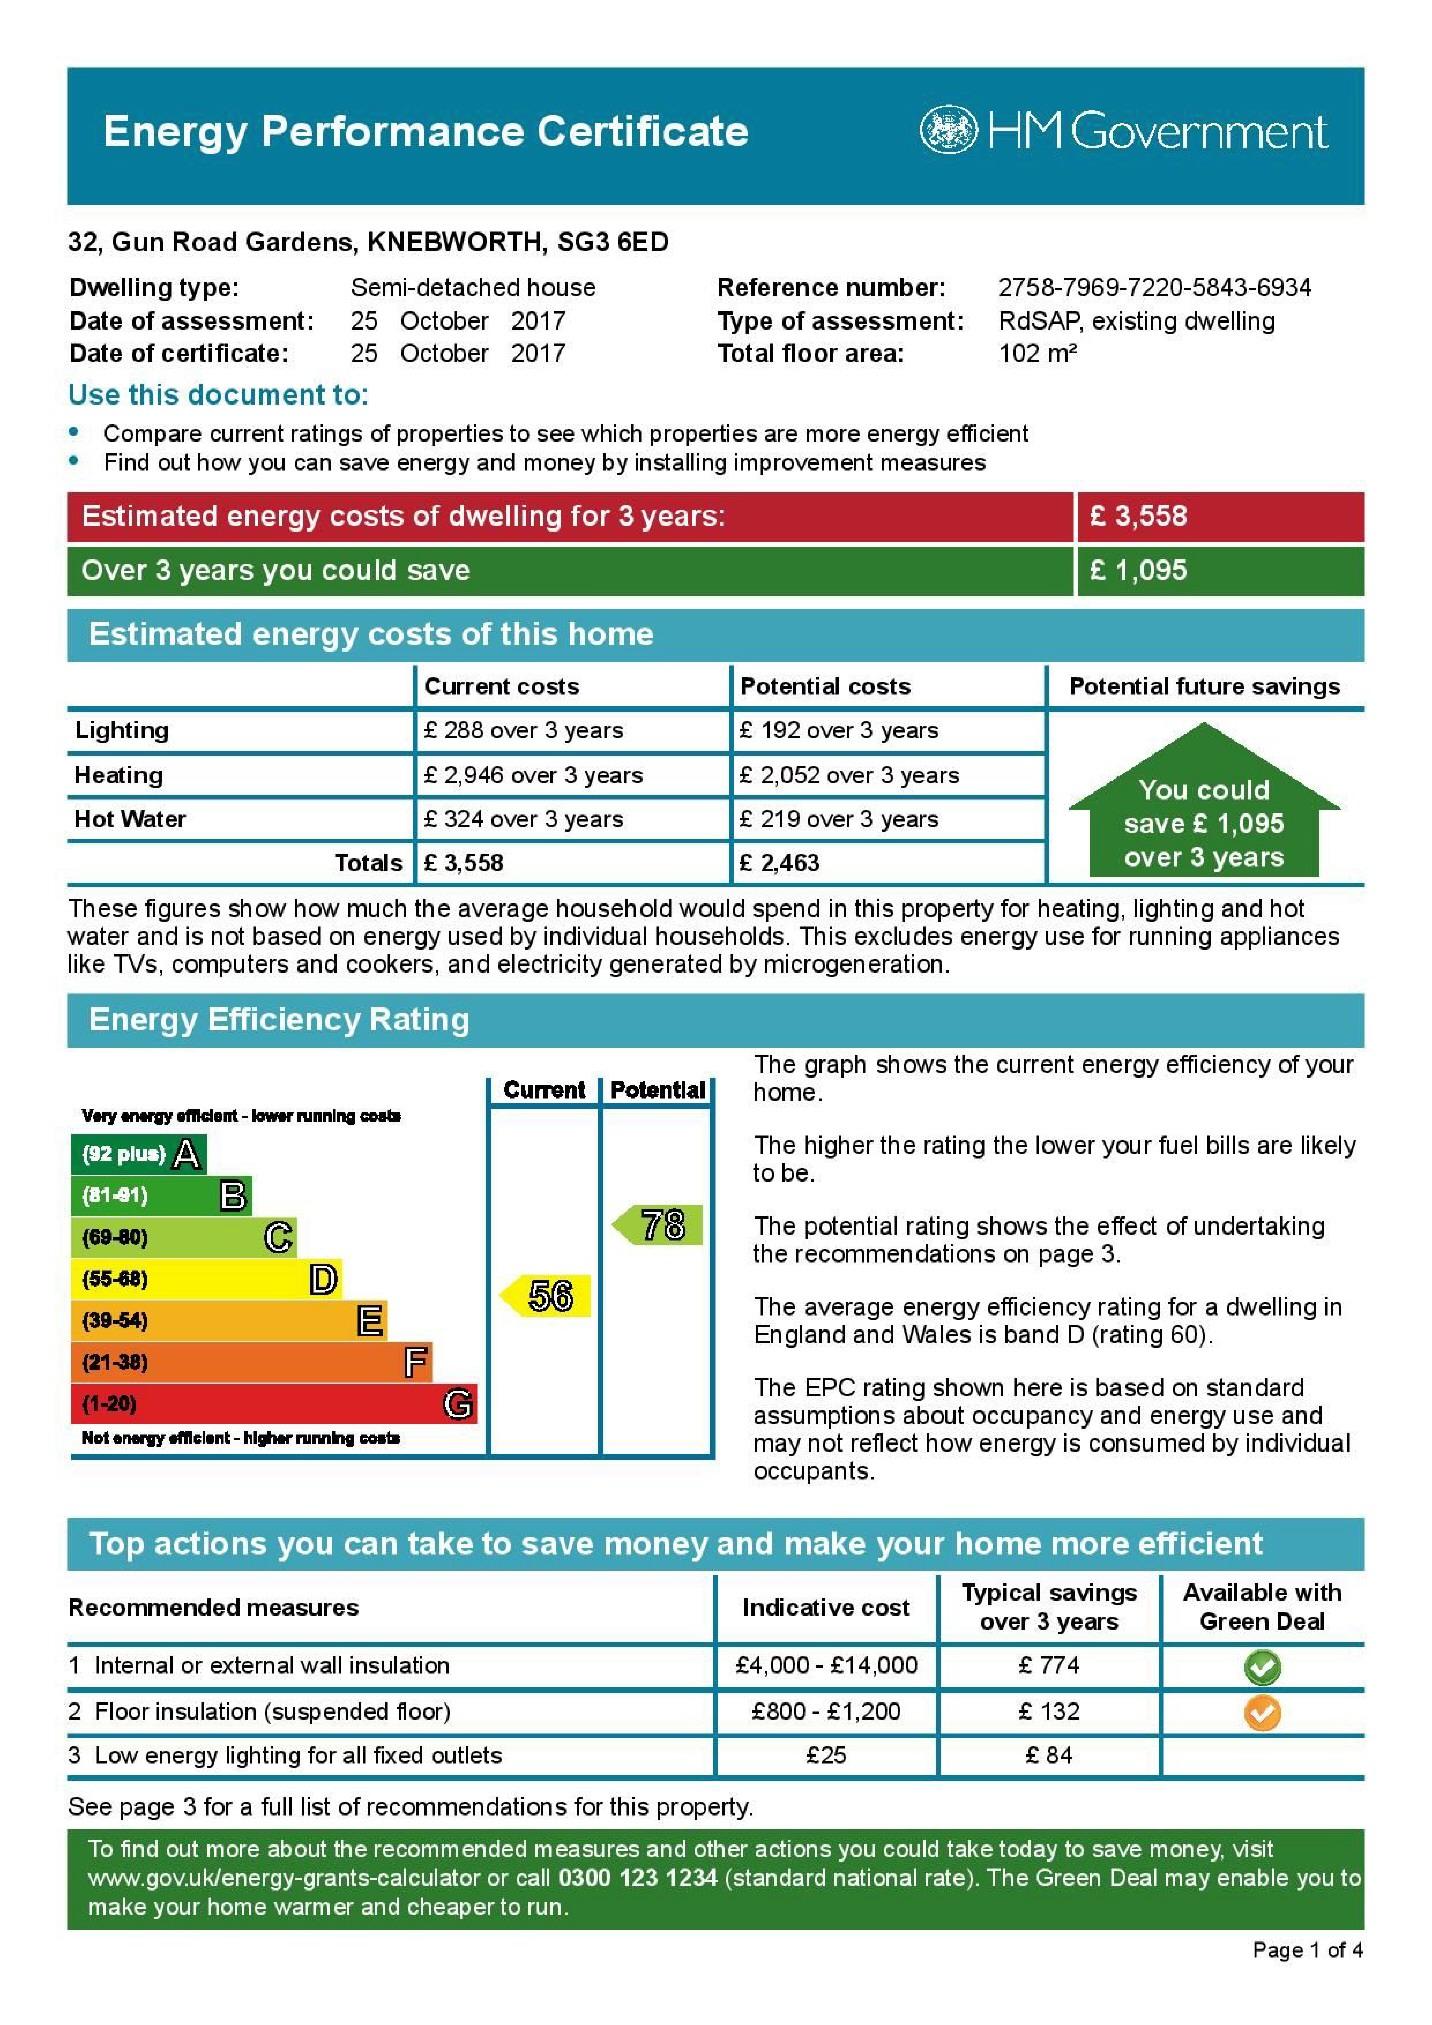 EPC Graph for Gun Road Gardens, Knebworth, SG3 6ED